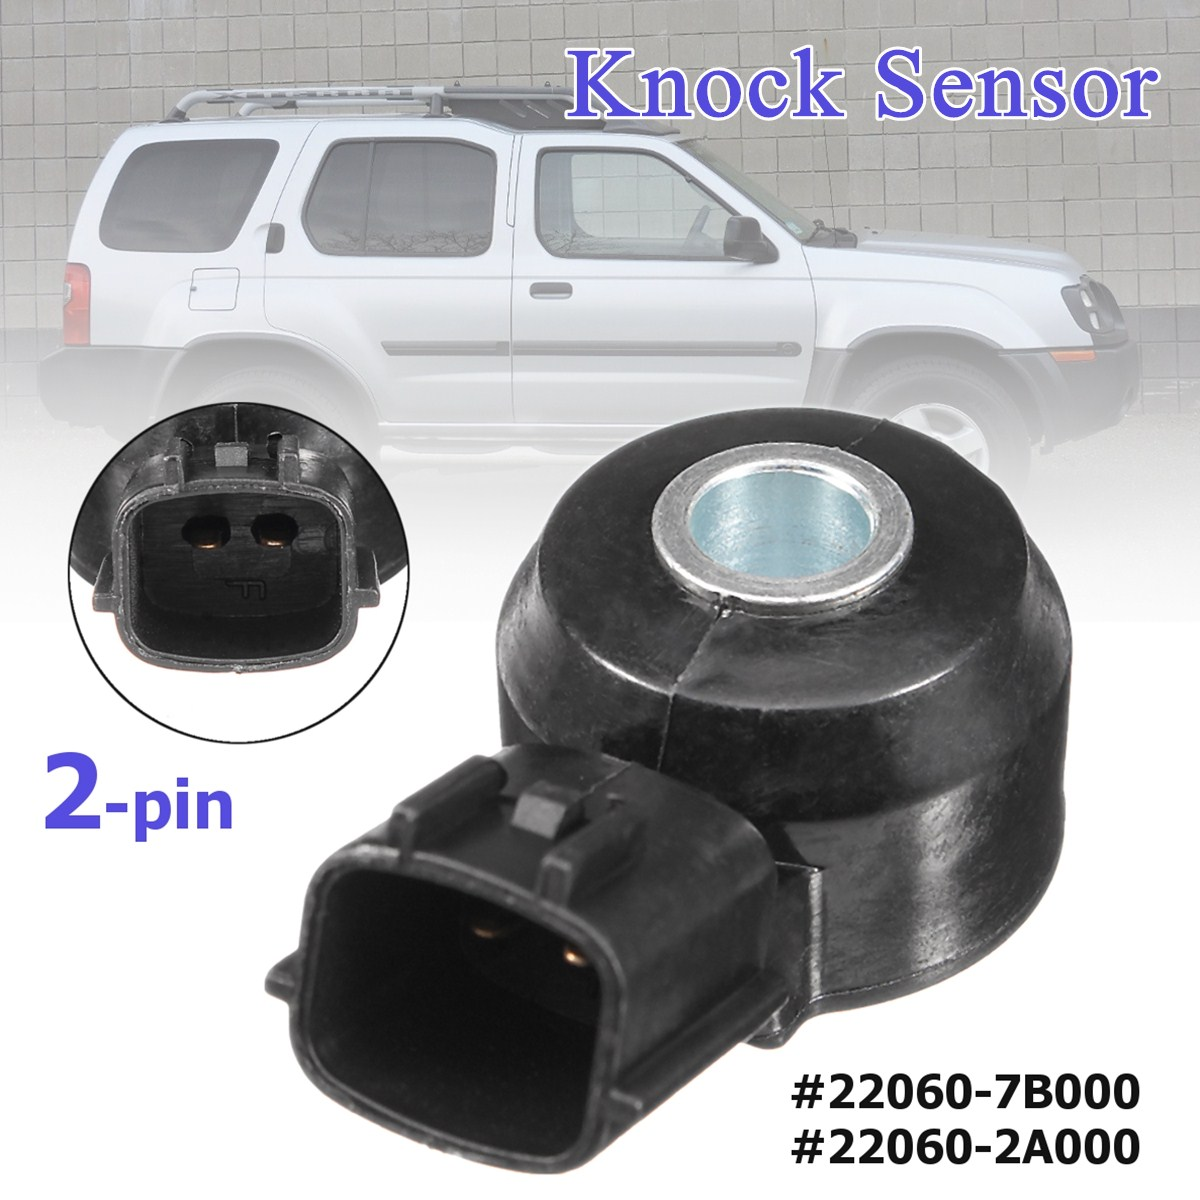 #22060-7B000 #22060-2A000 2-pin Knock Sensor For Nissan/Mercury Frontier Xterra Villager Quest 1999 2000 2001 2002 2003 2004